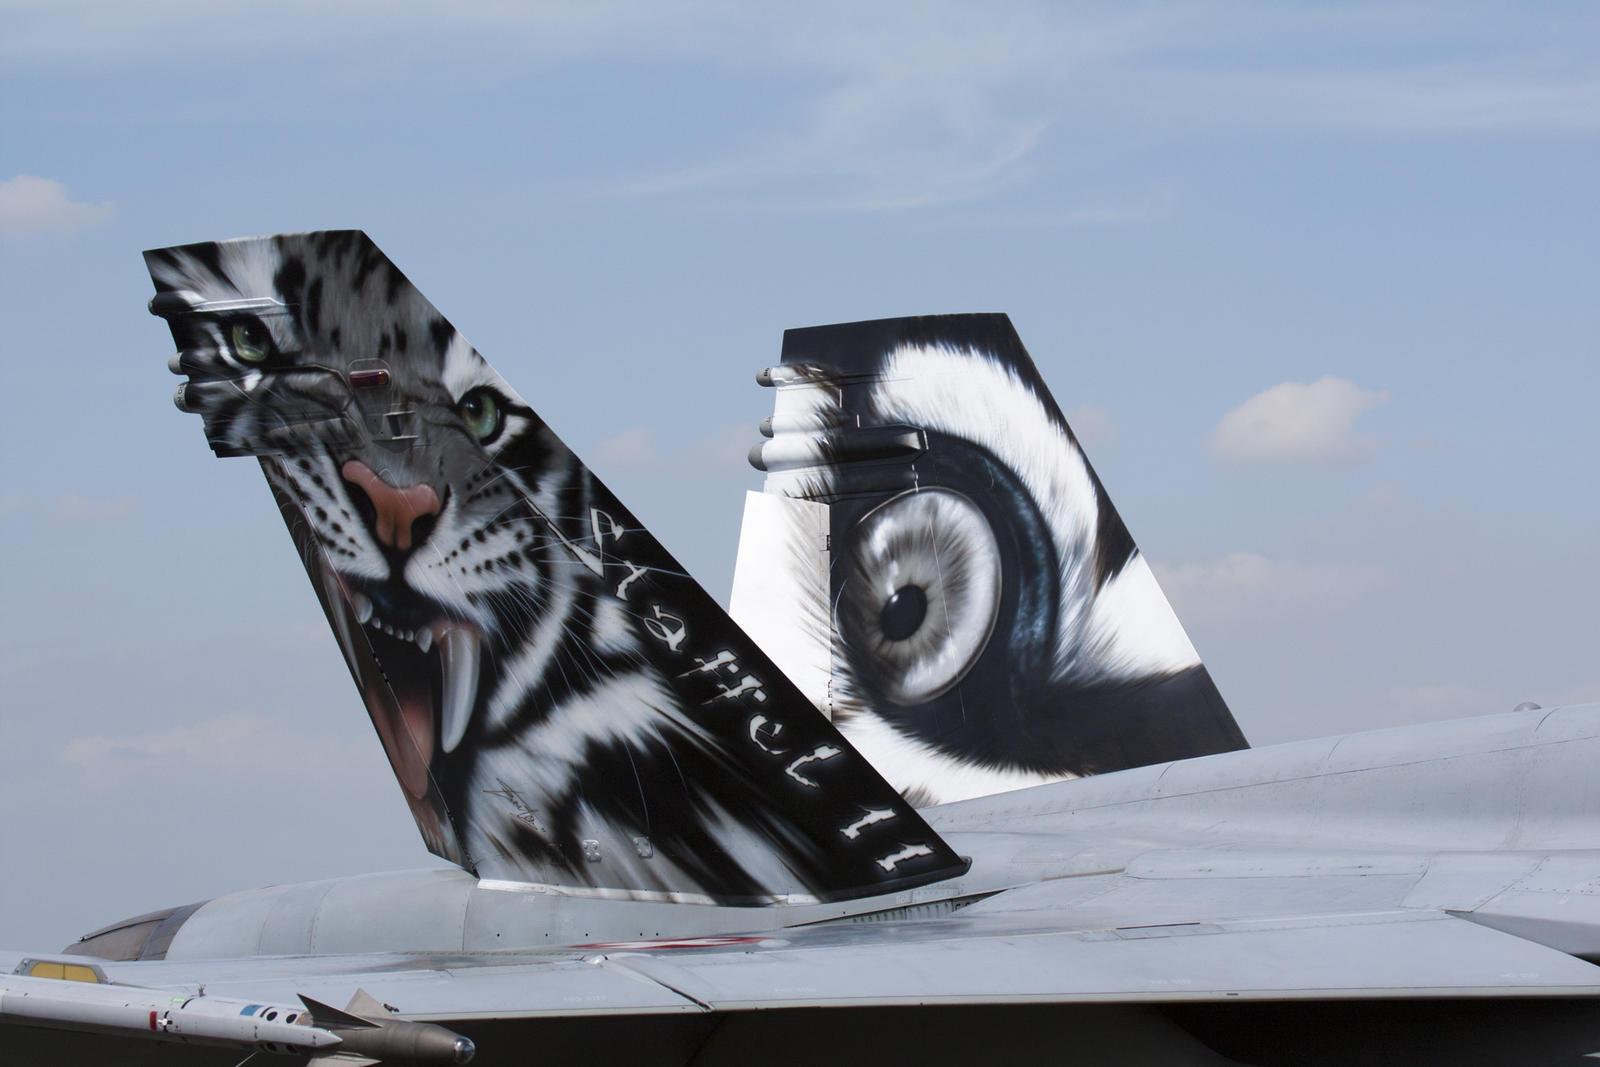 F-18 Tiger Meet Livery by Rikkubeauty on DeviantArt